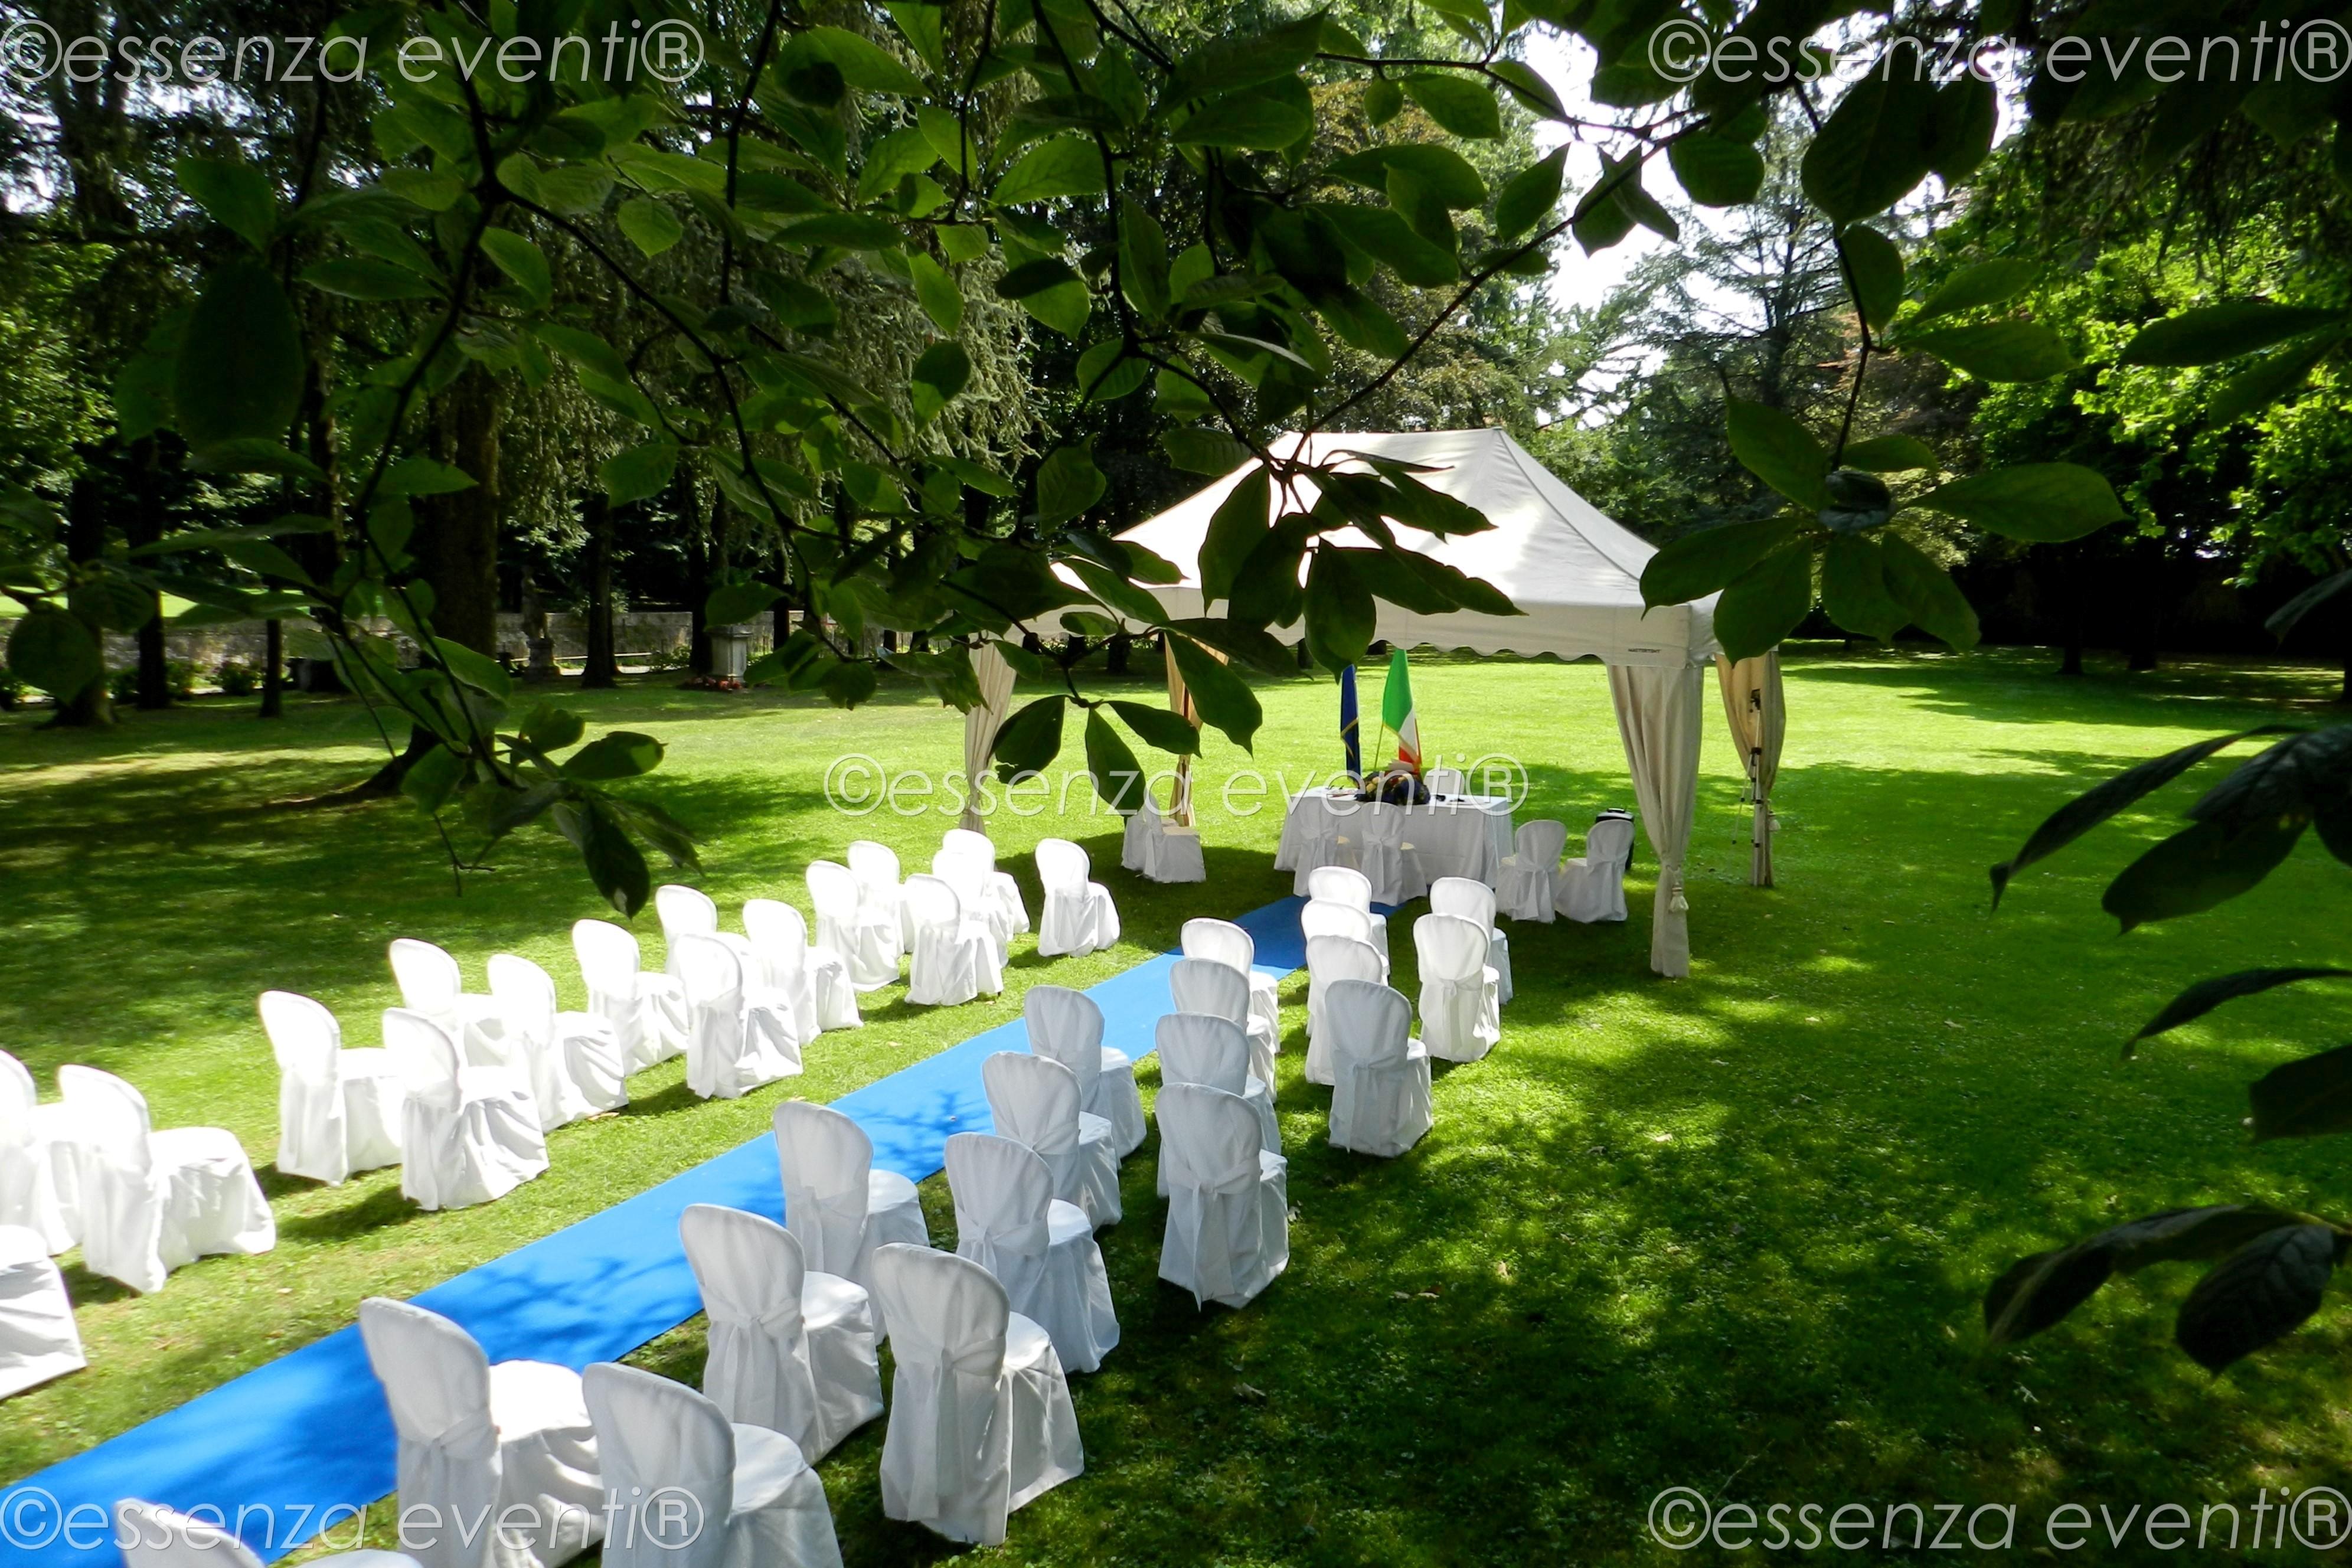 Cerimonia Celebrante Simbolico essenza Eventi®